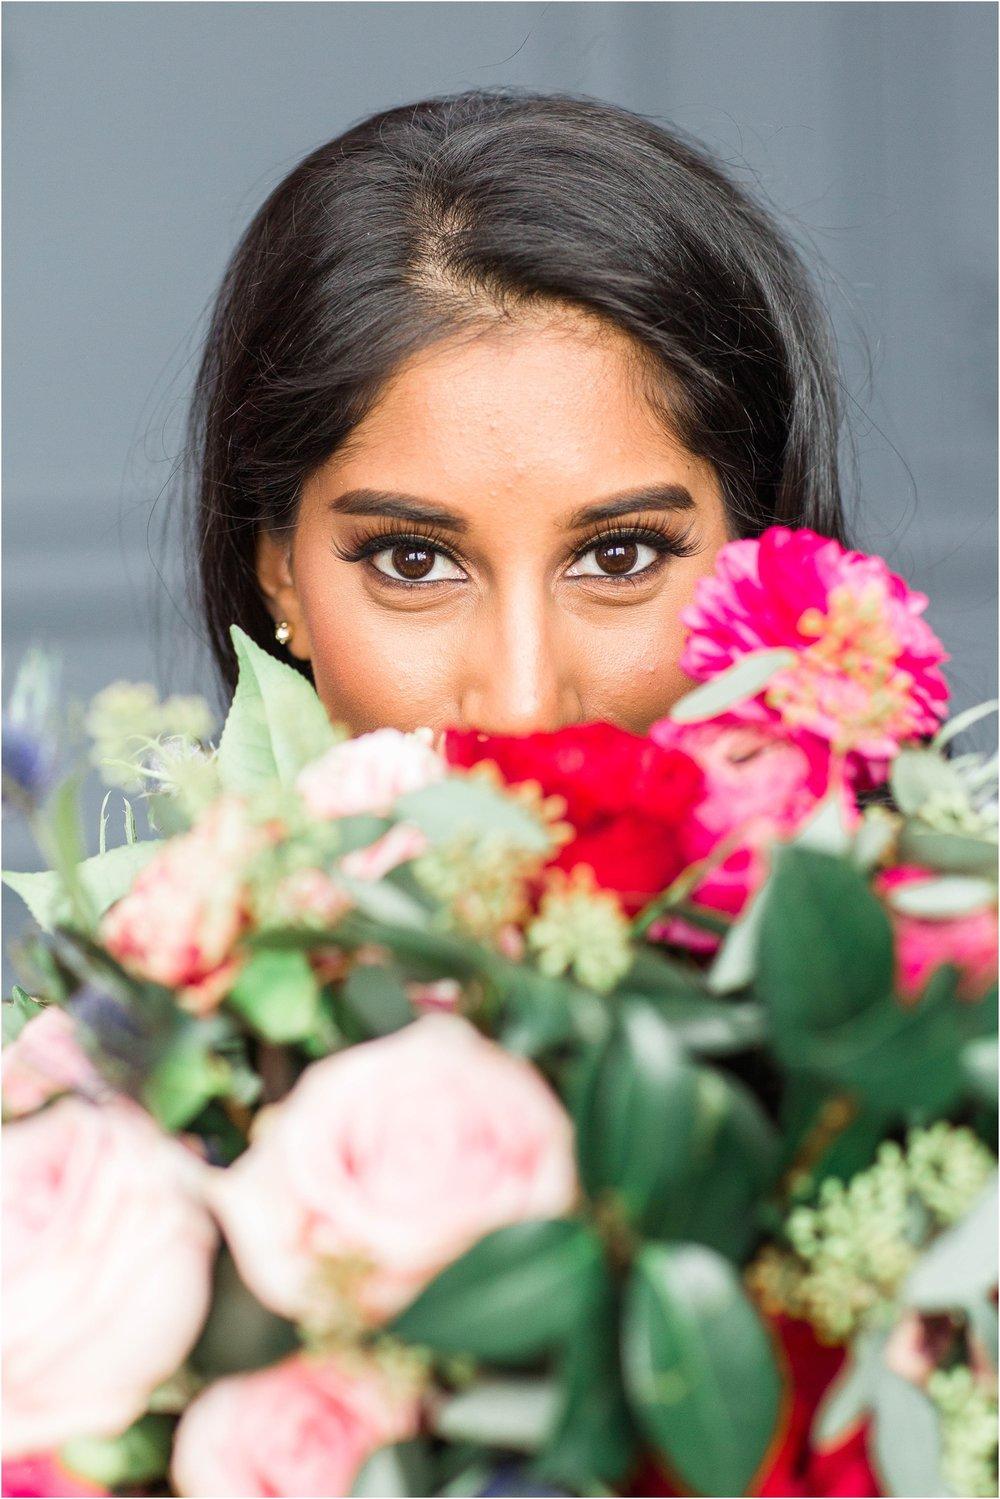 Mint-Room-Studios-Anniversary-Session-Toronto-Mississauga-Brampton-Scarborough-GTA-Pakistani-Indian-Wedding-Engagement-Photographer-Photography_0034.jpg